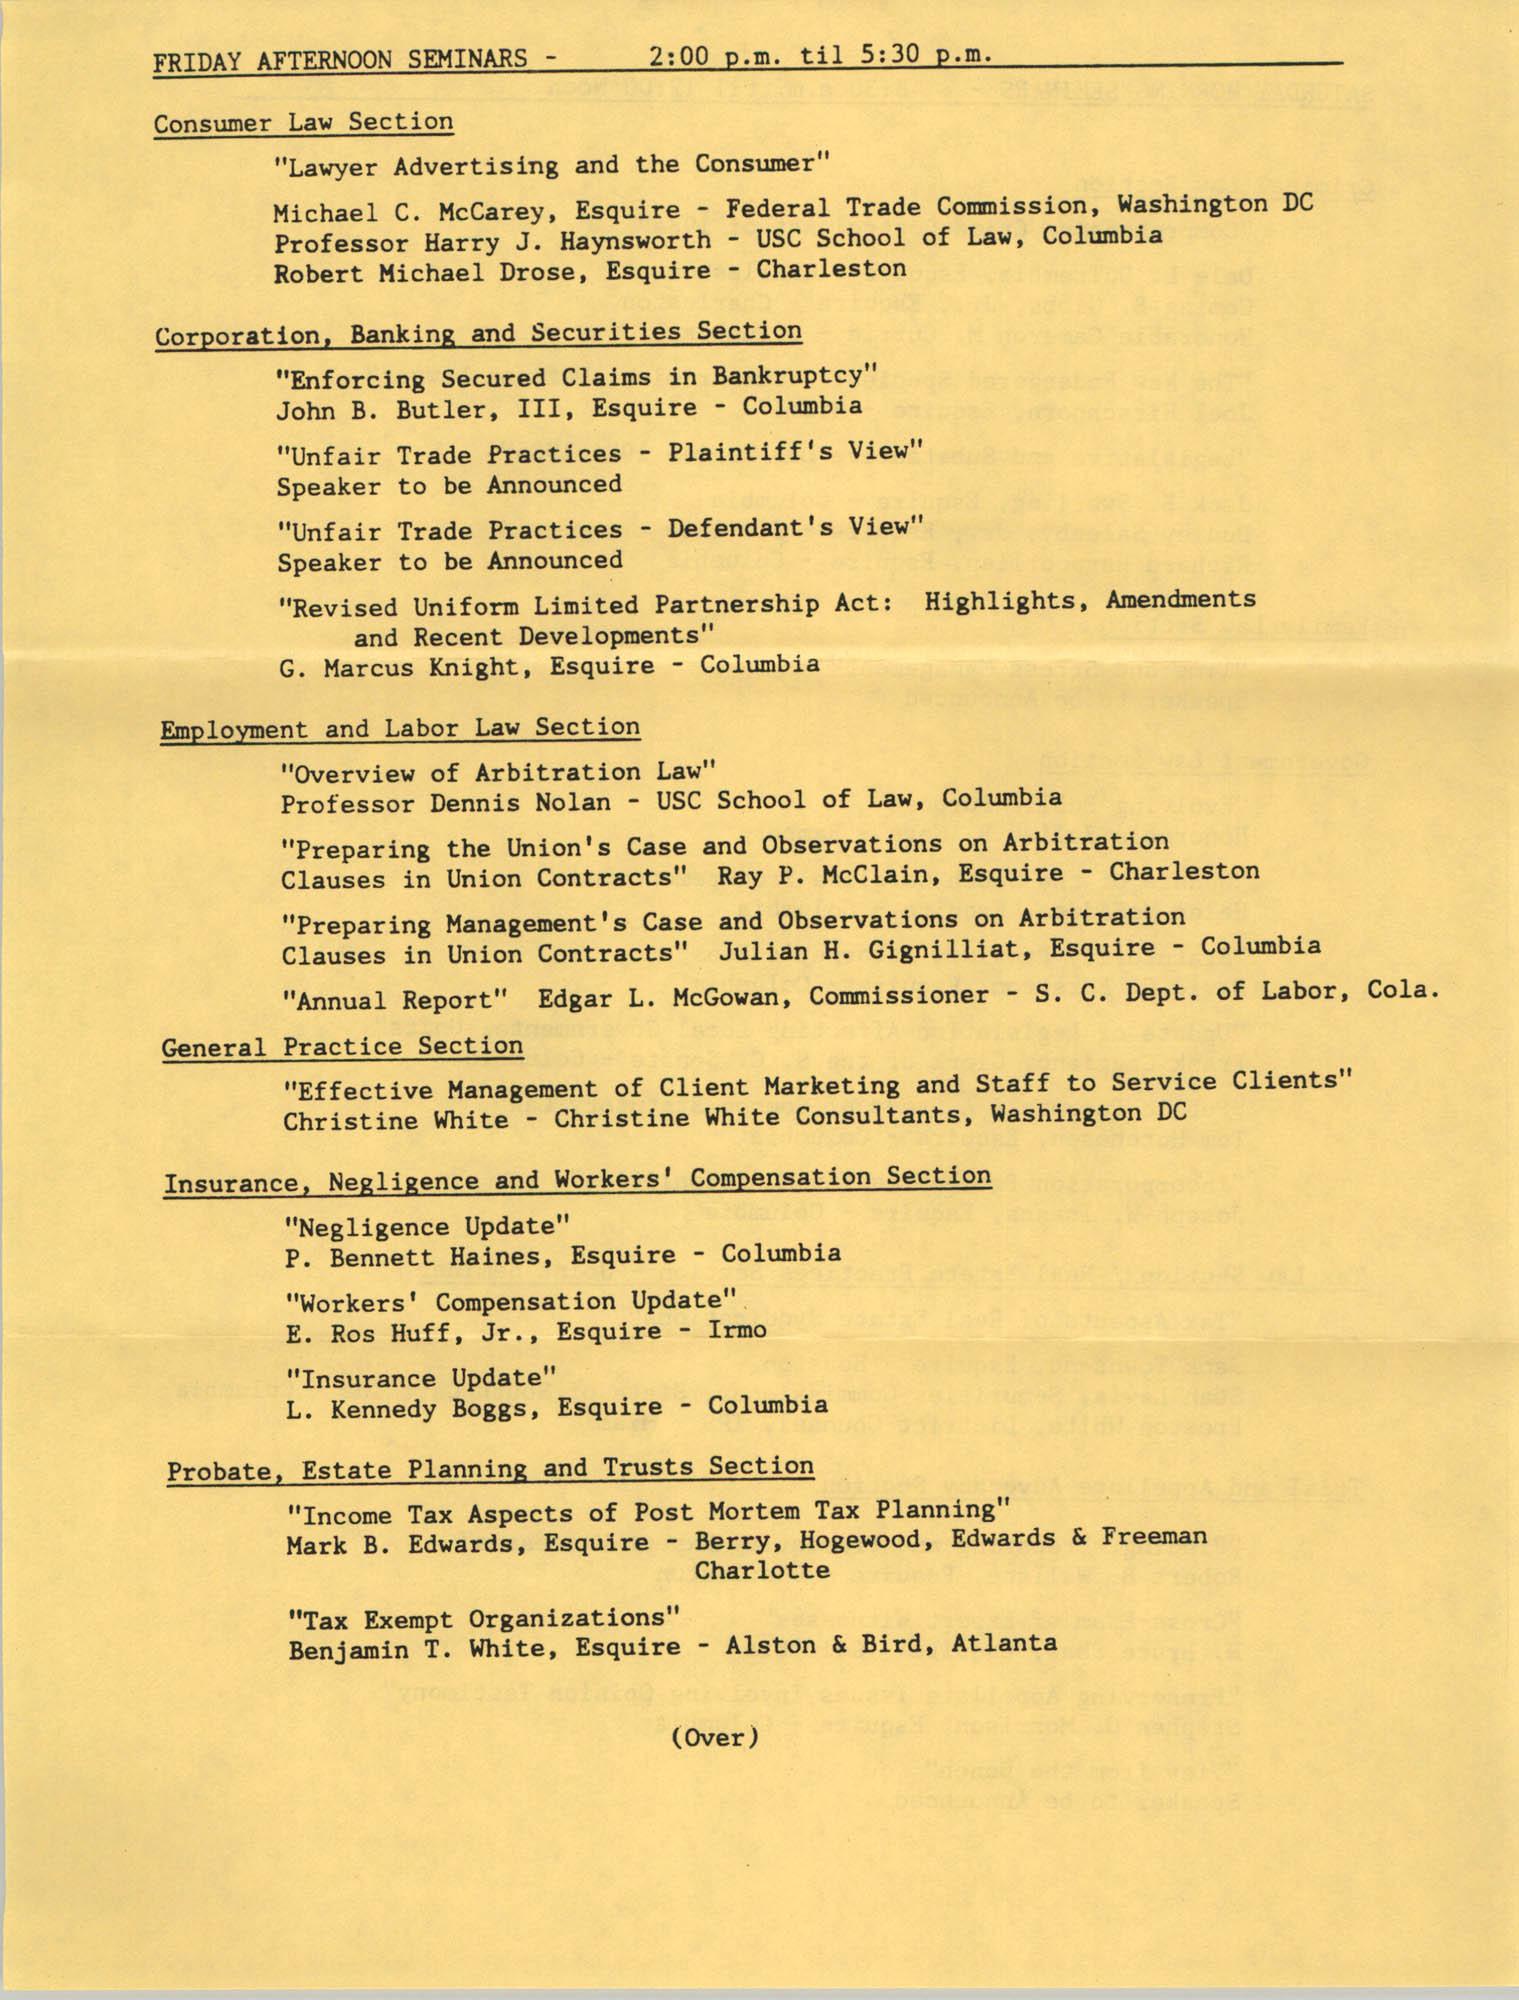 1985 Annual Meeting of  the South Carolina Bar, Seminar Descriptions